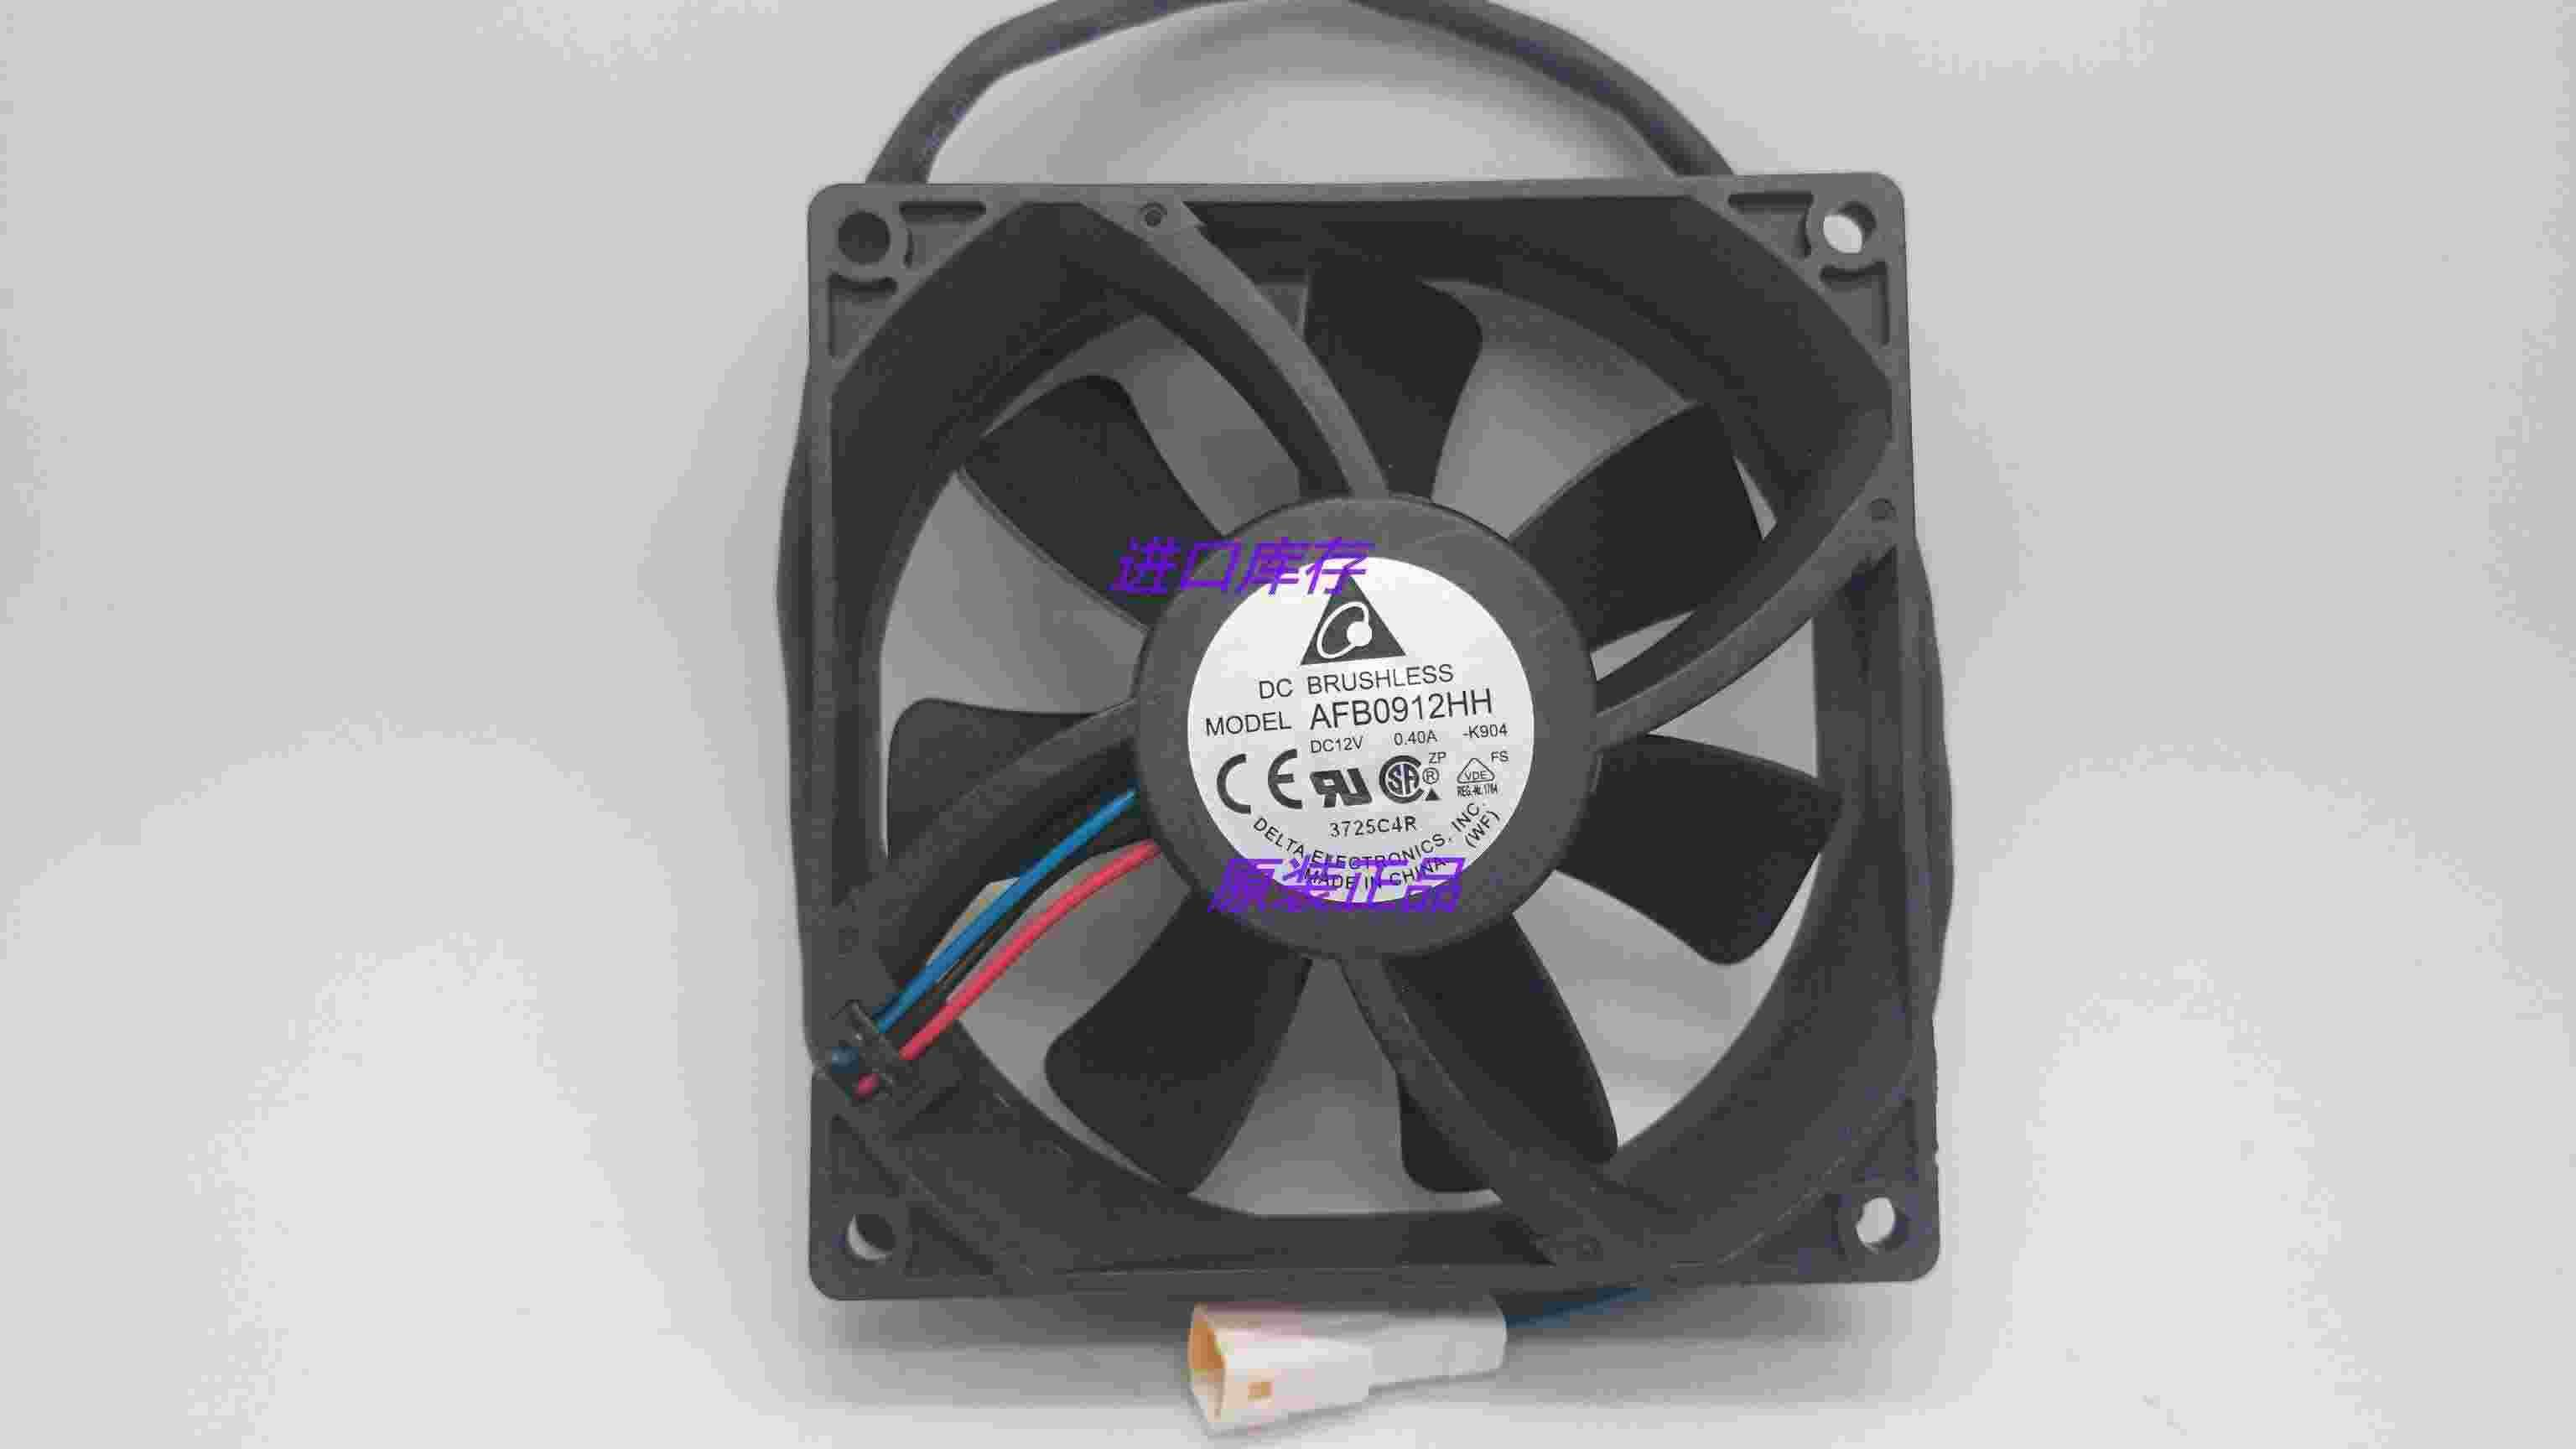 Brand new Delta AFB0912HH 12V 0.40A RG alarm signal 9cm case cooling fan 5500RPM 80CFM